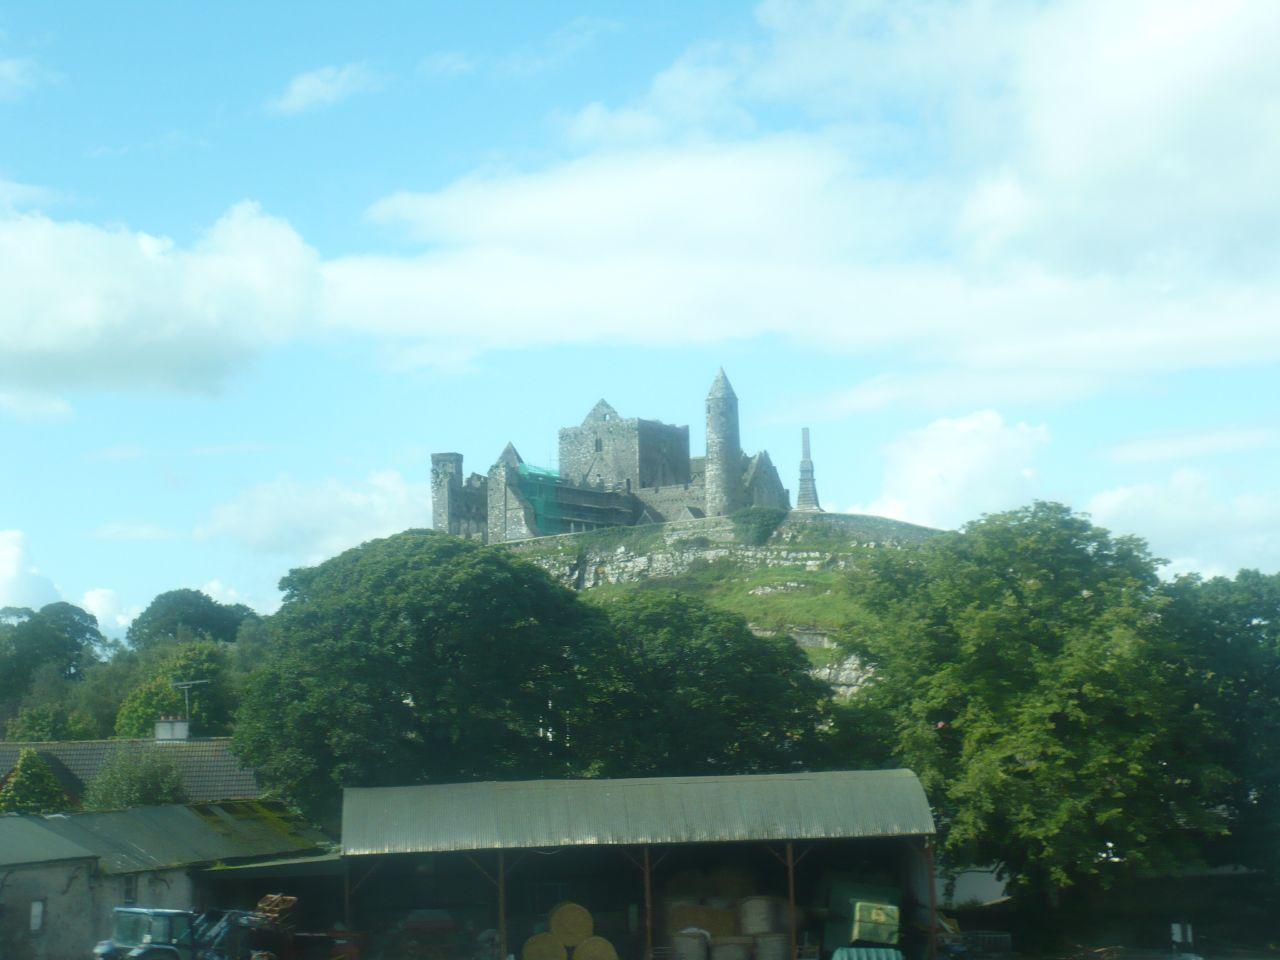 castillo de Caher